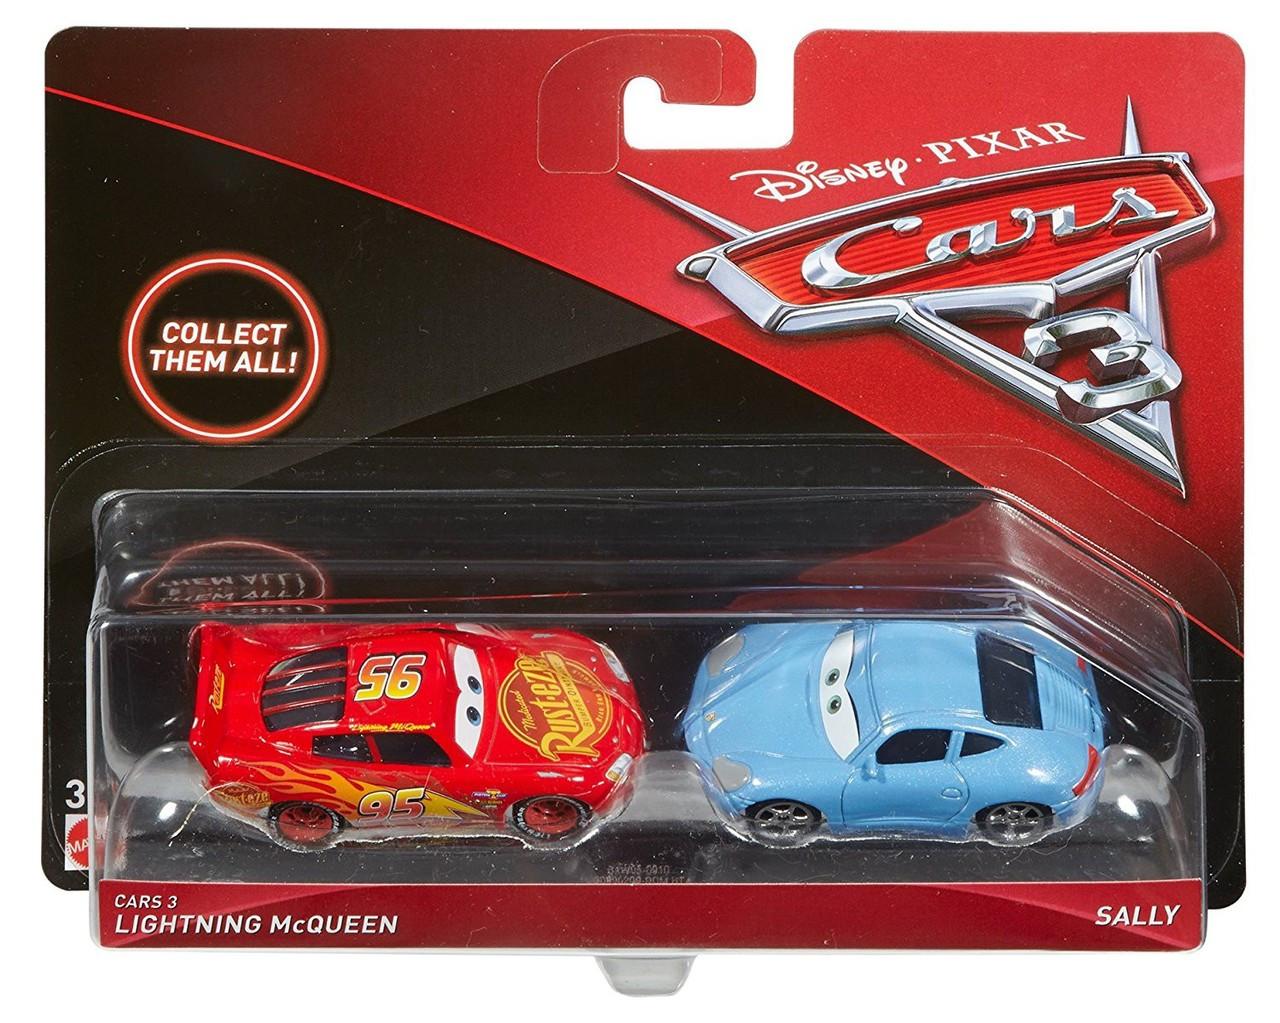 Disney Pixar Cars Cars 3 Lightning Mcqueen Sally Diecast 2 Pack